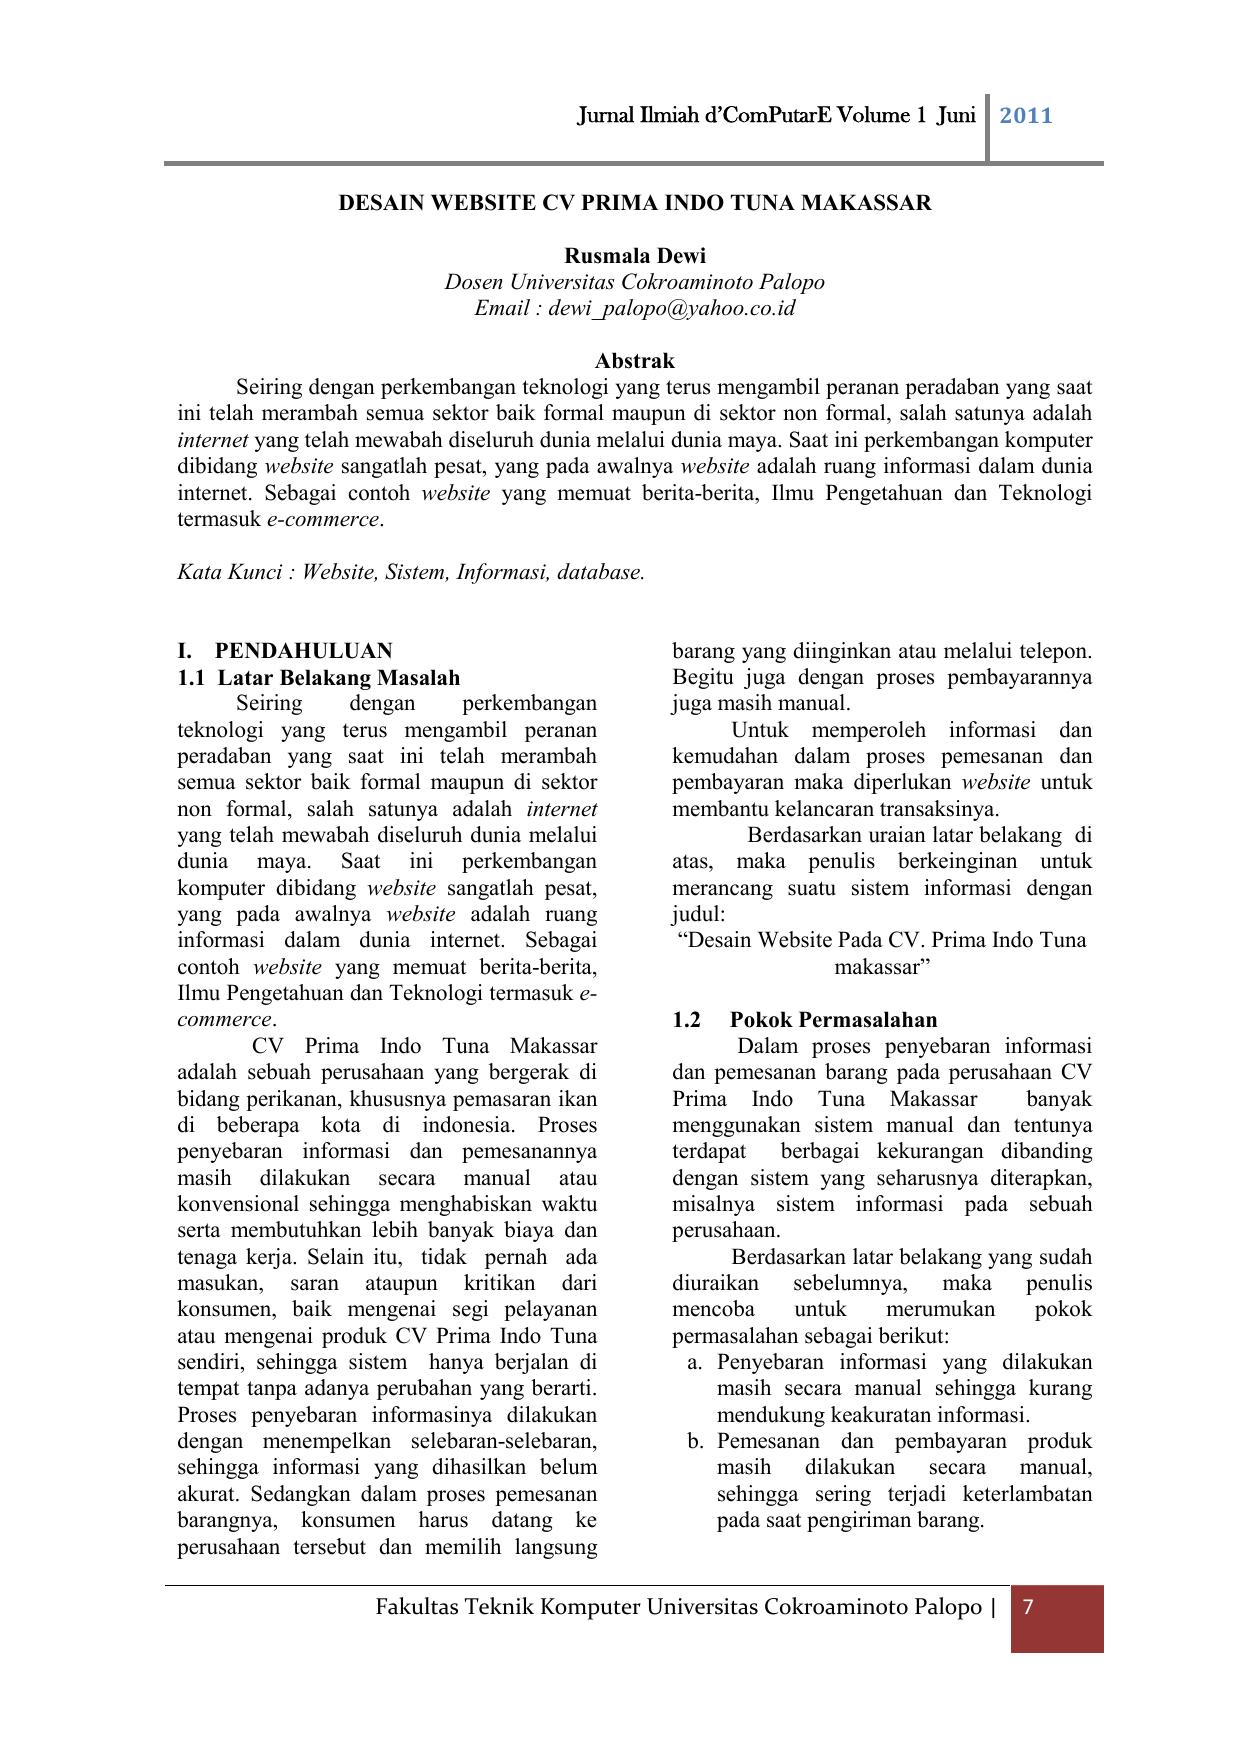 Jurnal Ilmiah D Computare Volume 1 Juni